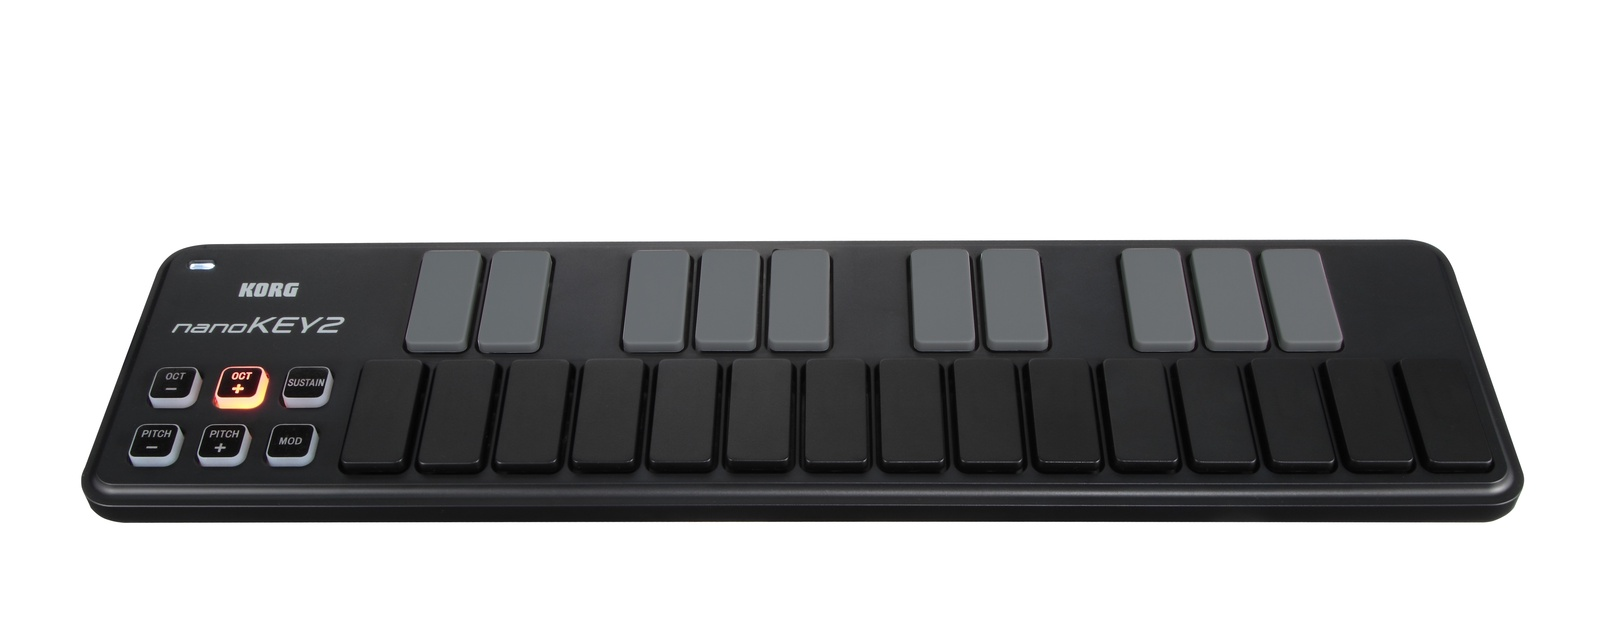 Портативная USB-MIDI-клавиатура KORG, цвет: черный, NANOKEY2-BK цены